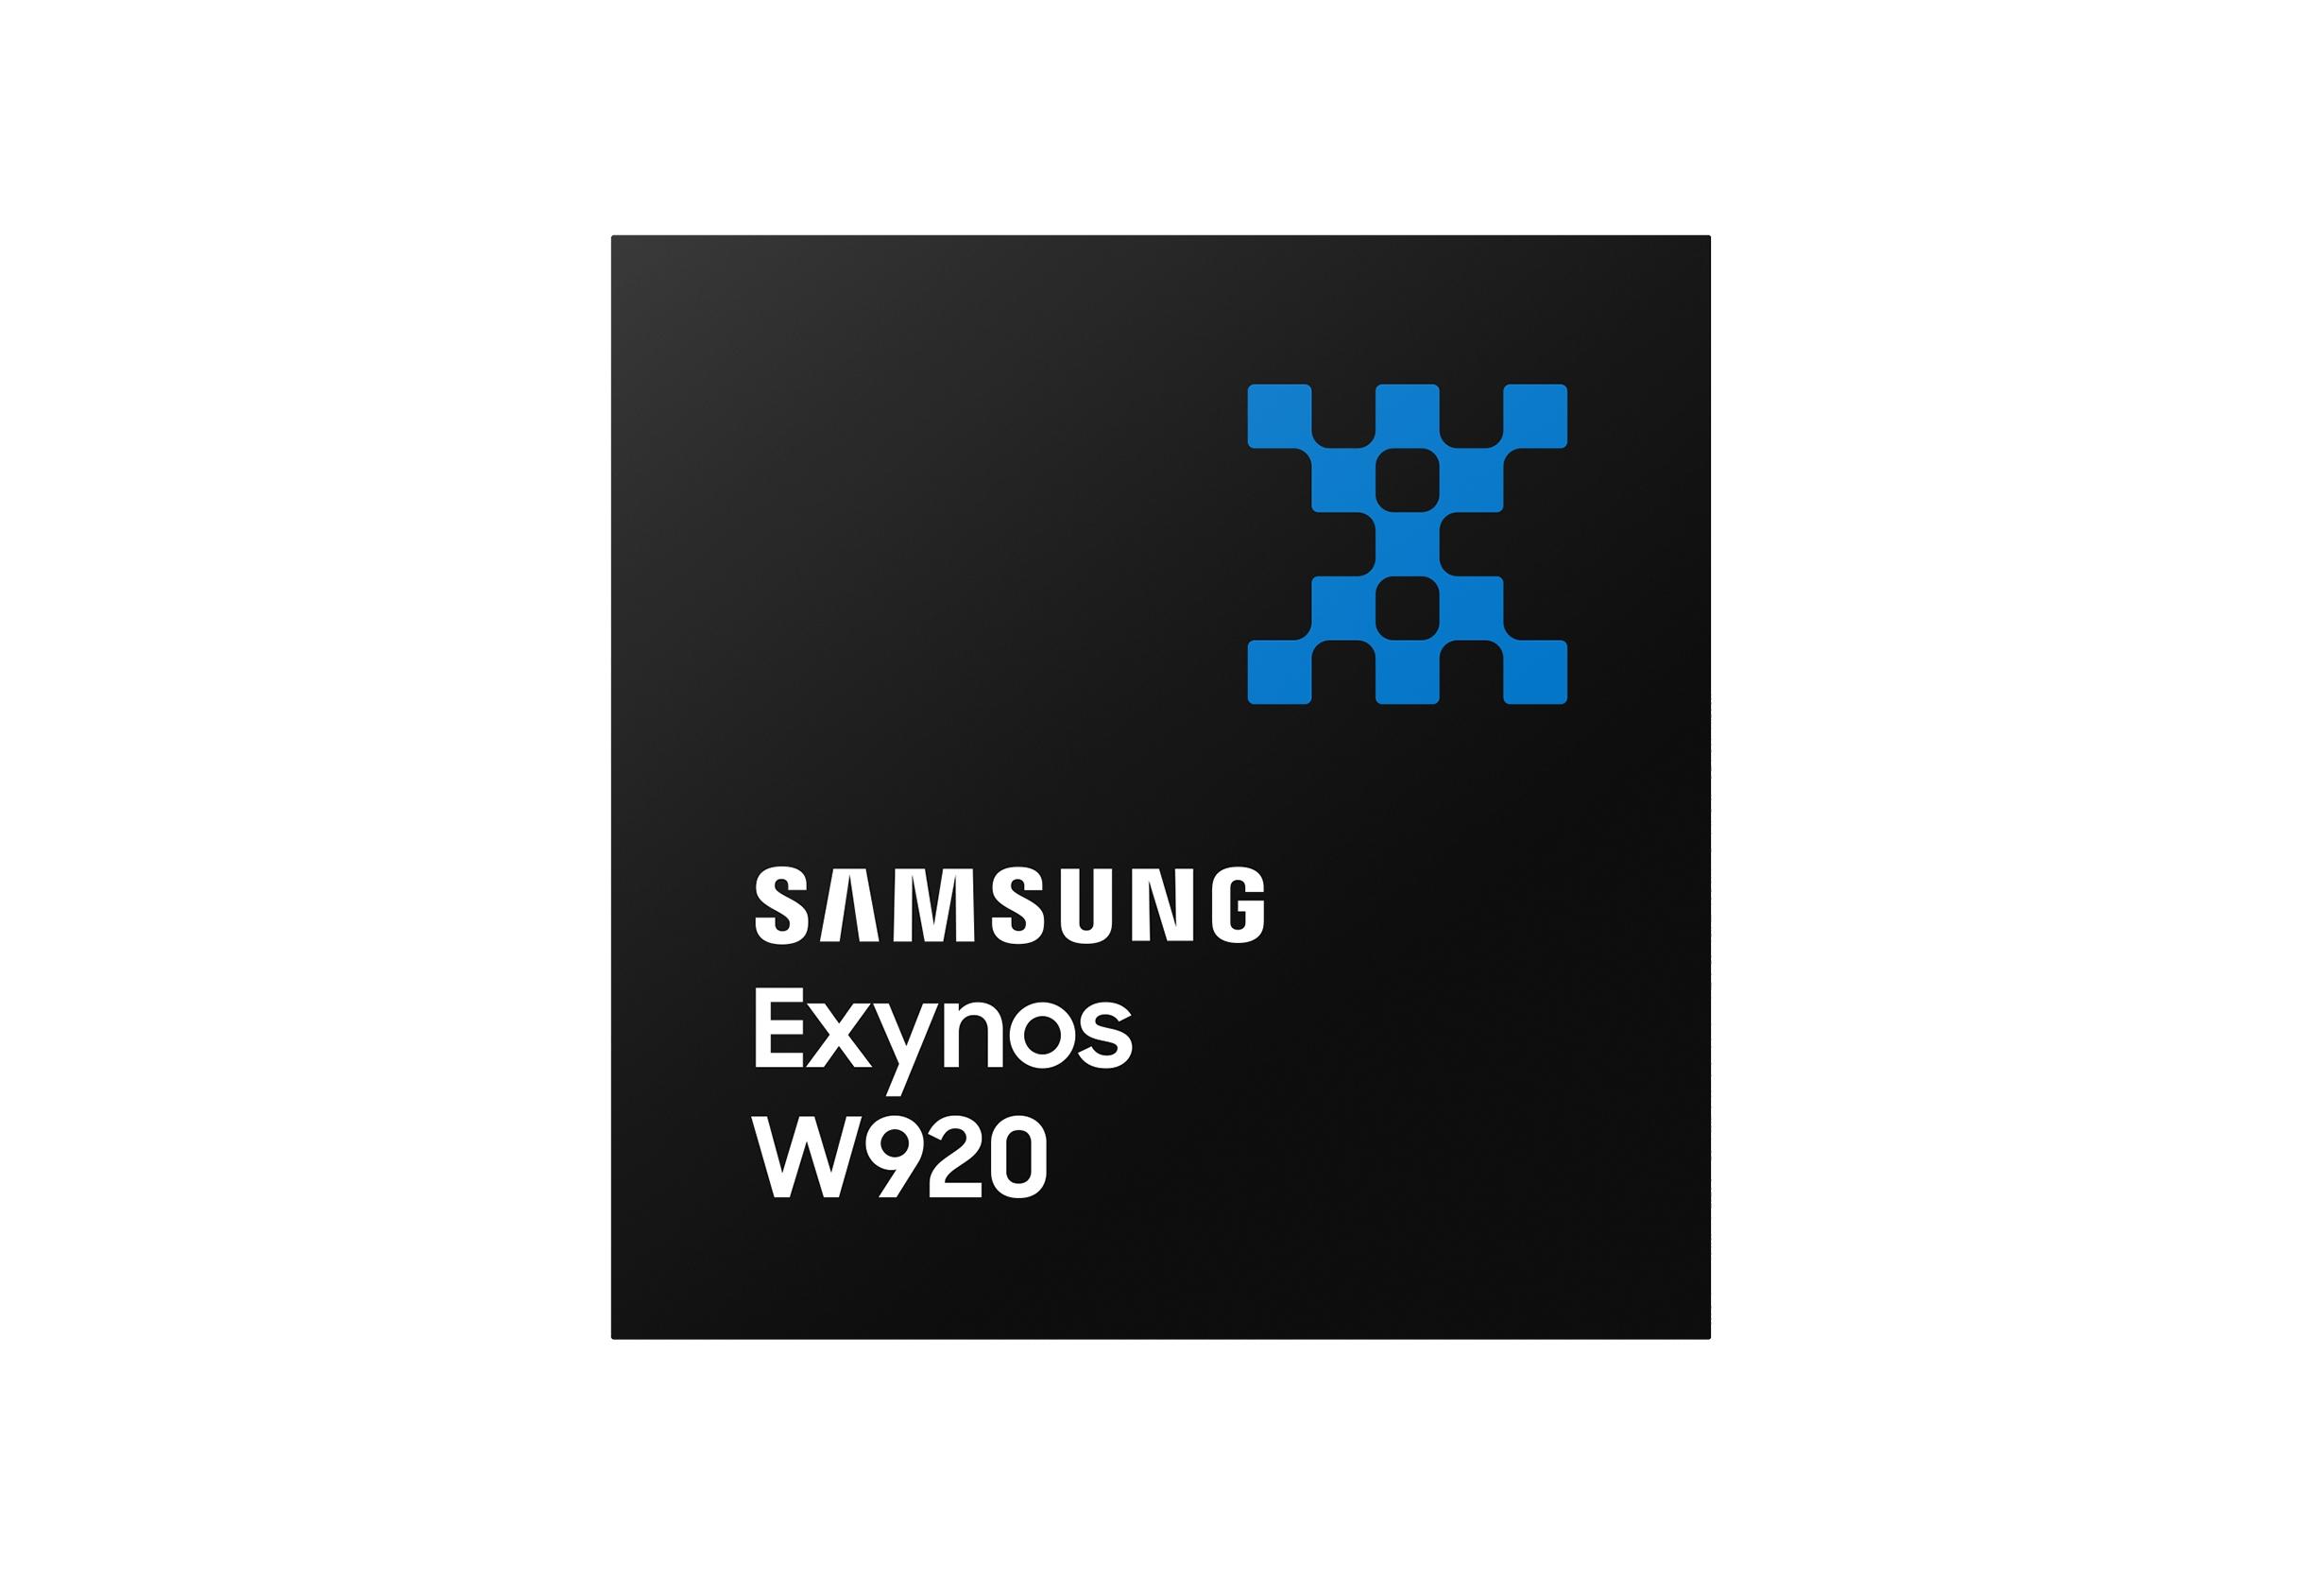 Samsung представила Exynos W920: 5-нанометровый процессор для смарт-часов Galaxy Watch 4 и Galaxy Watch 4 Classic